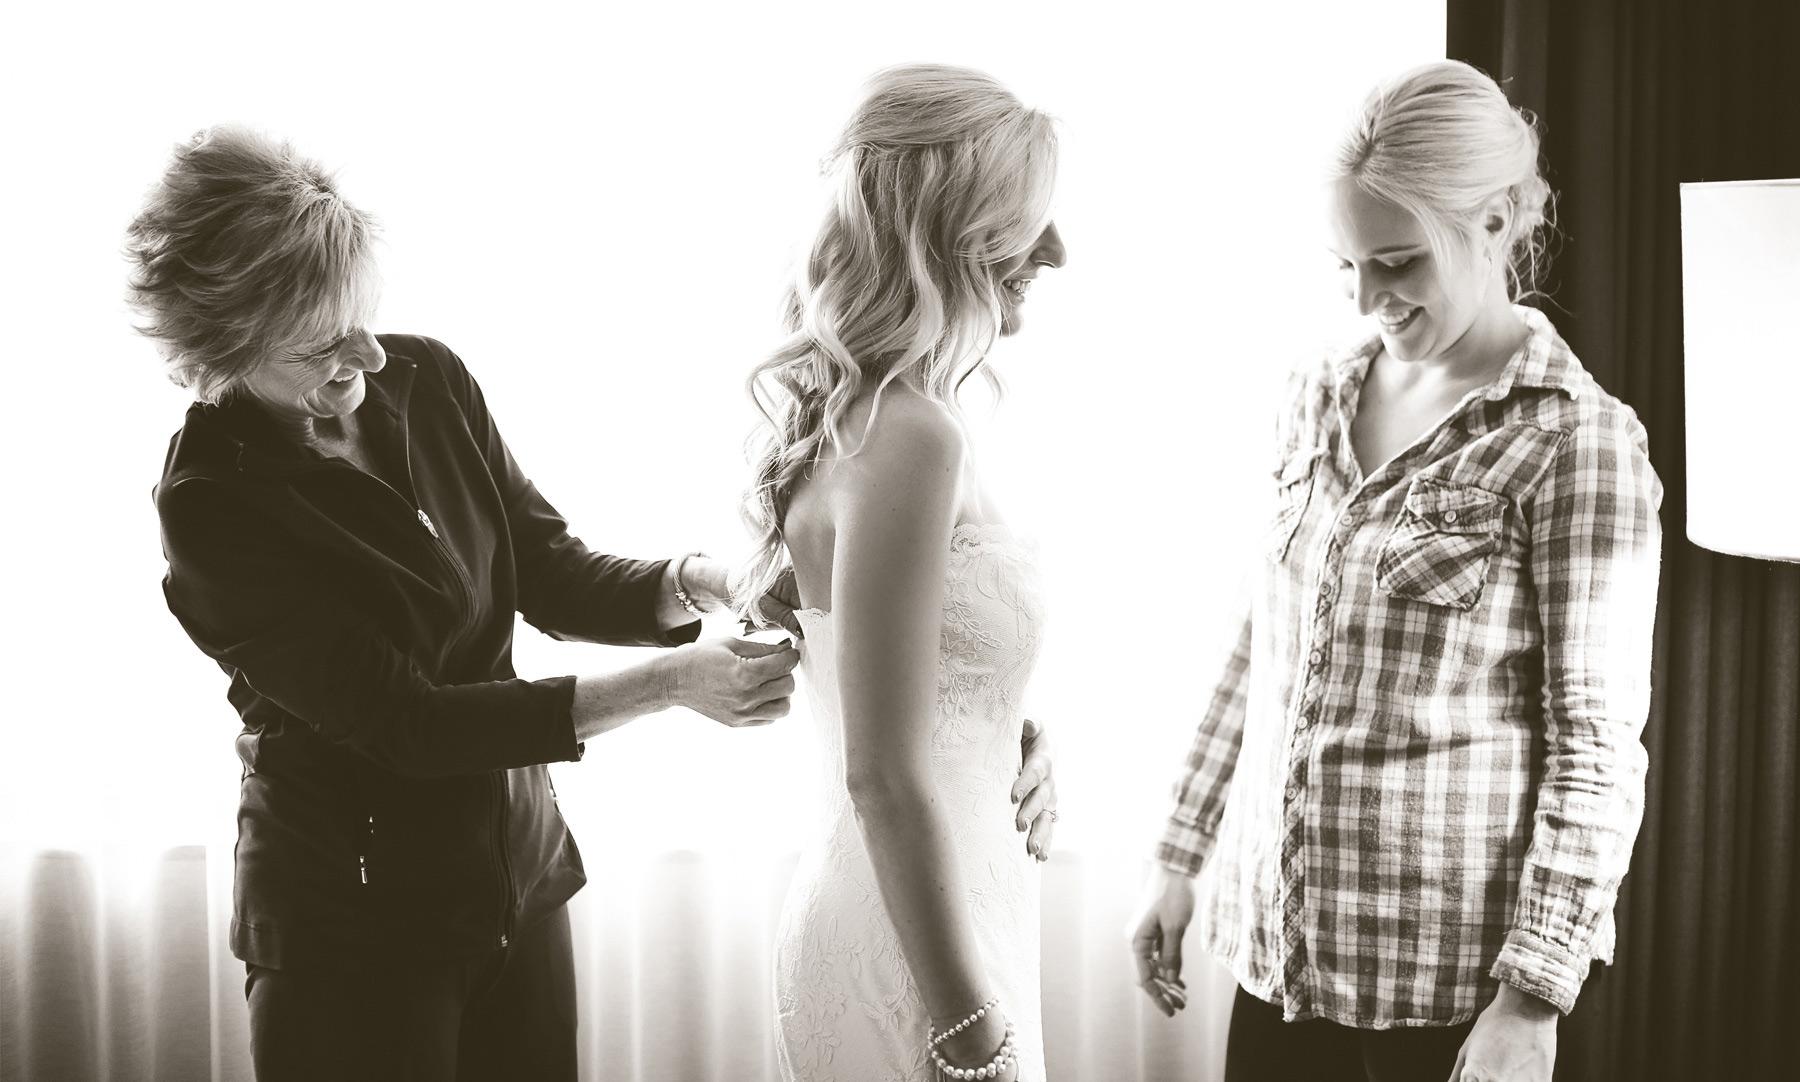 01-Minneapolis-Minnesota-Wedding-Photography-by-Vick-Photography-Downtown-Bride-Dress-Caroline-and-J.jpg